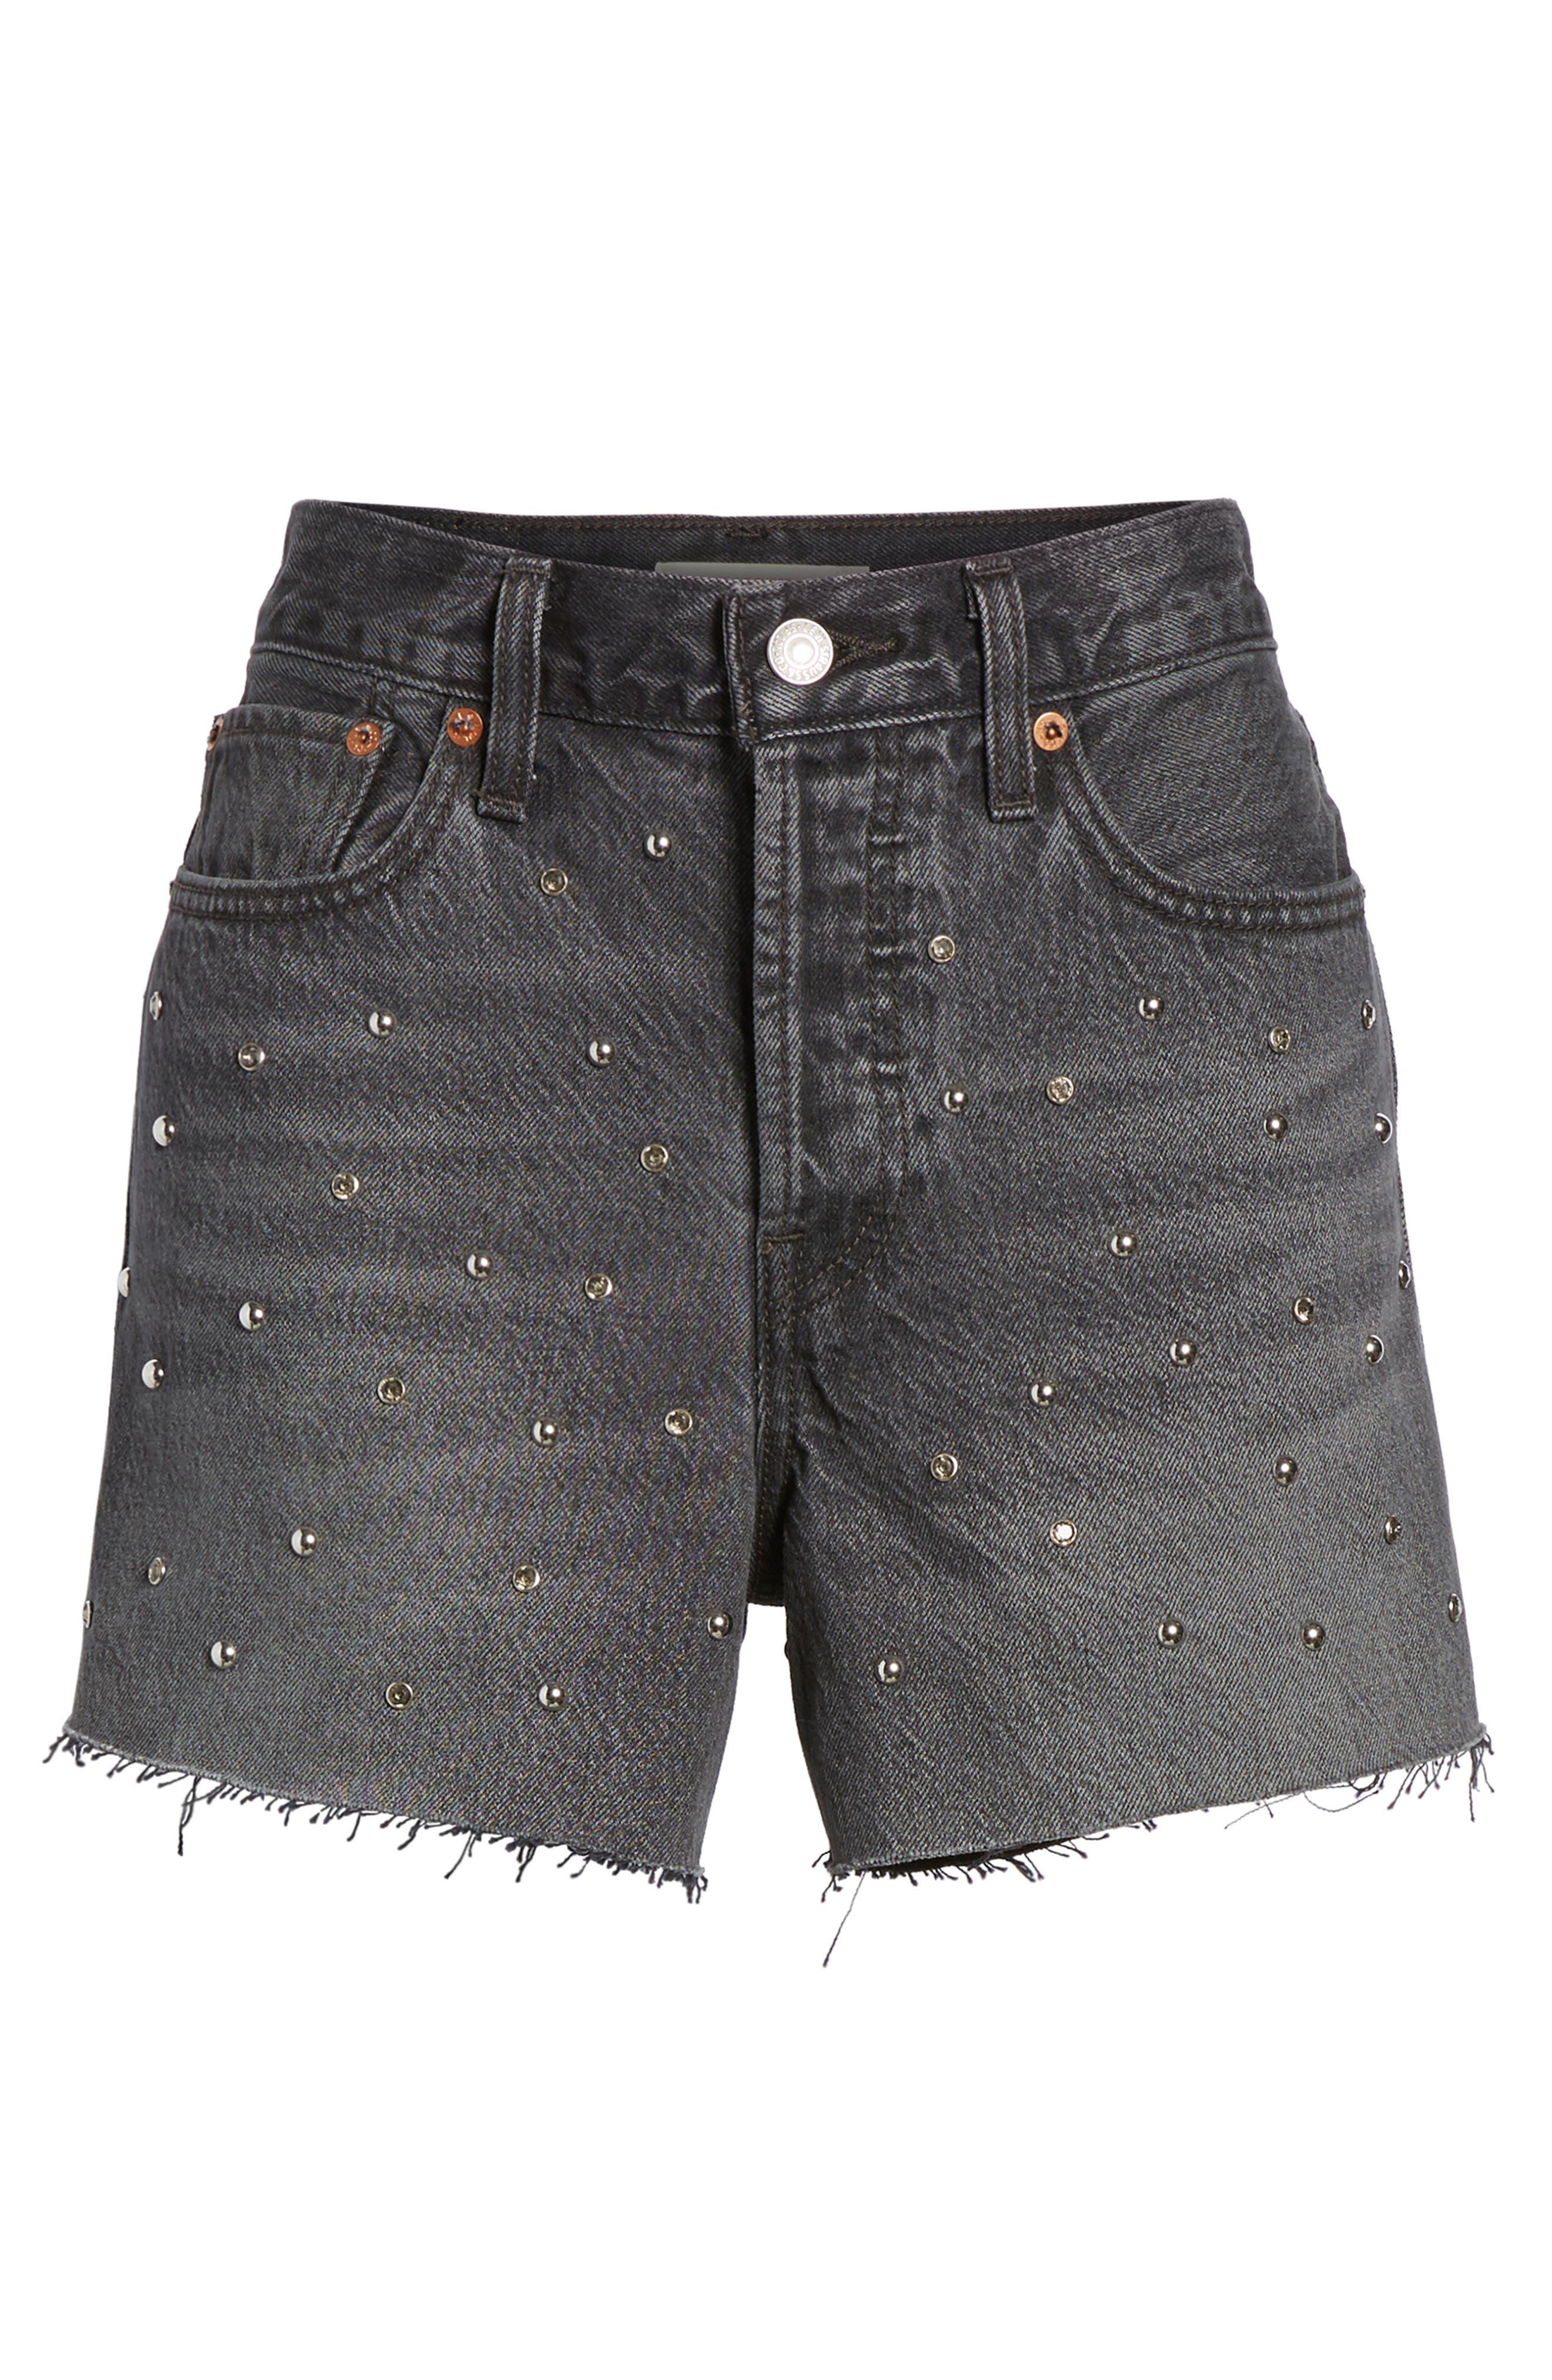 Wedgie High Waist Cutoff Denim Shorts,                             Alternate thumbnail 6, color,                             Bling Bling